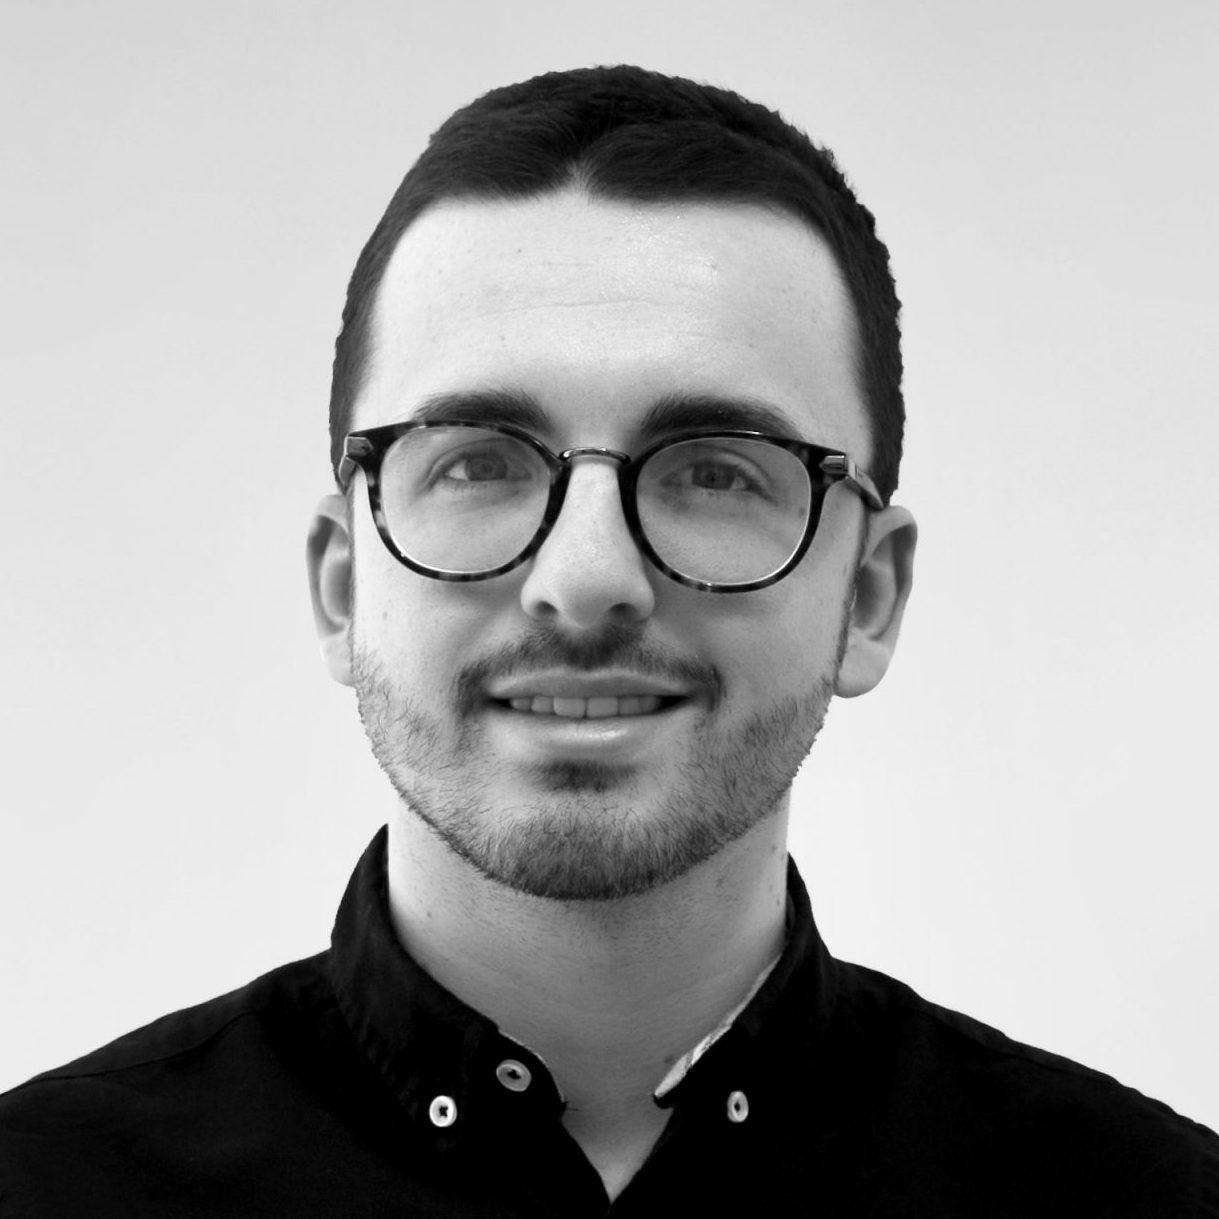 https://ksrarchitects.com/wp-content/uploads/2021/06/Eddie-Brighter-scaled-e1623327387408.jpg